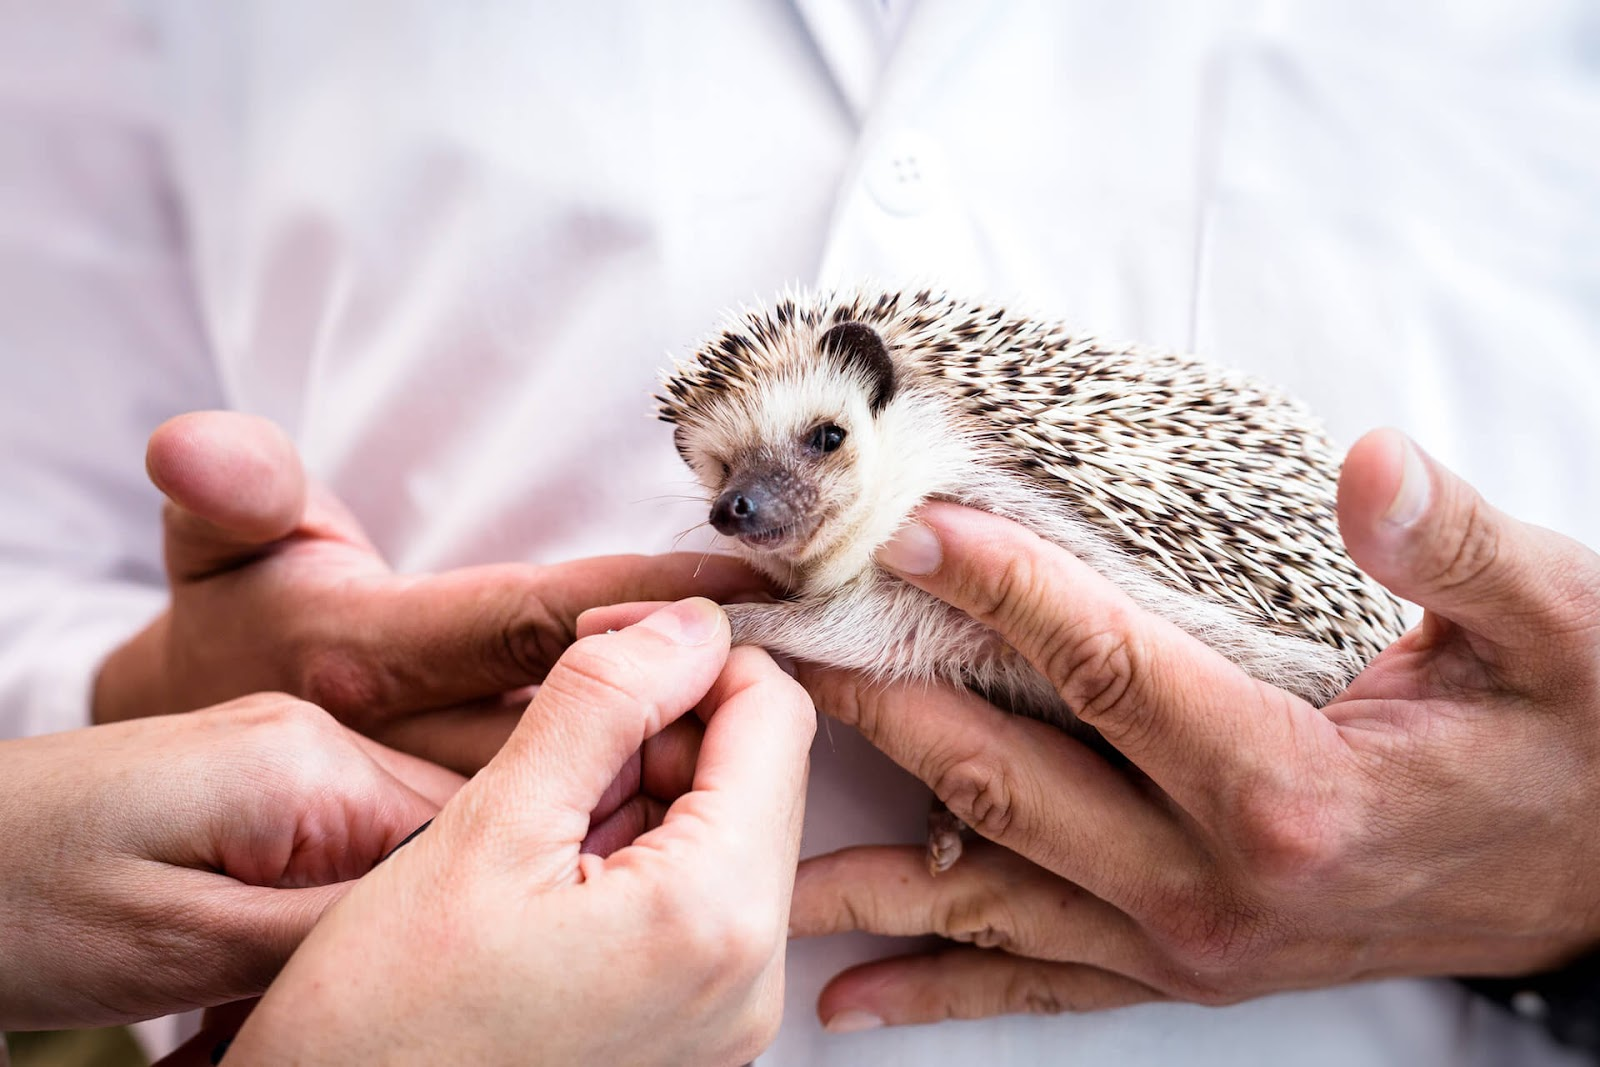 Vet holding a sickly looking hedgehog